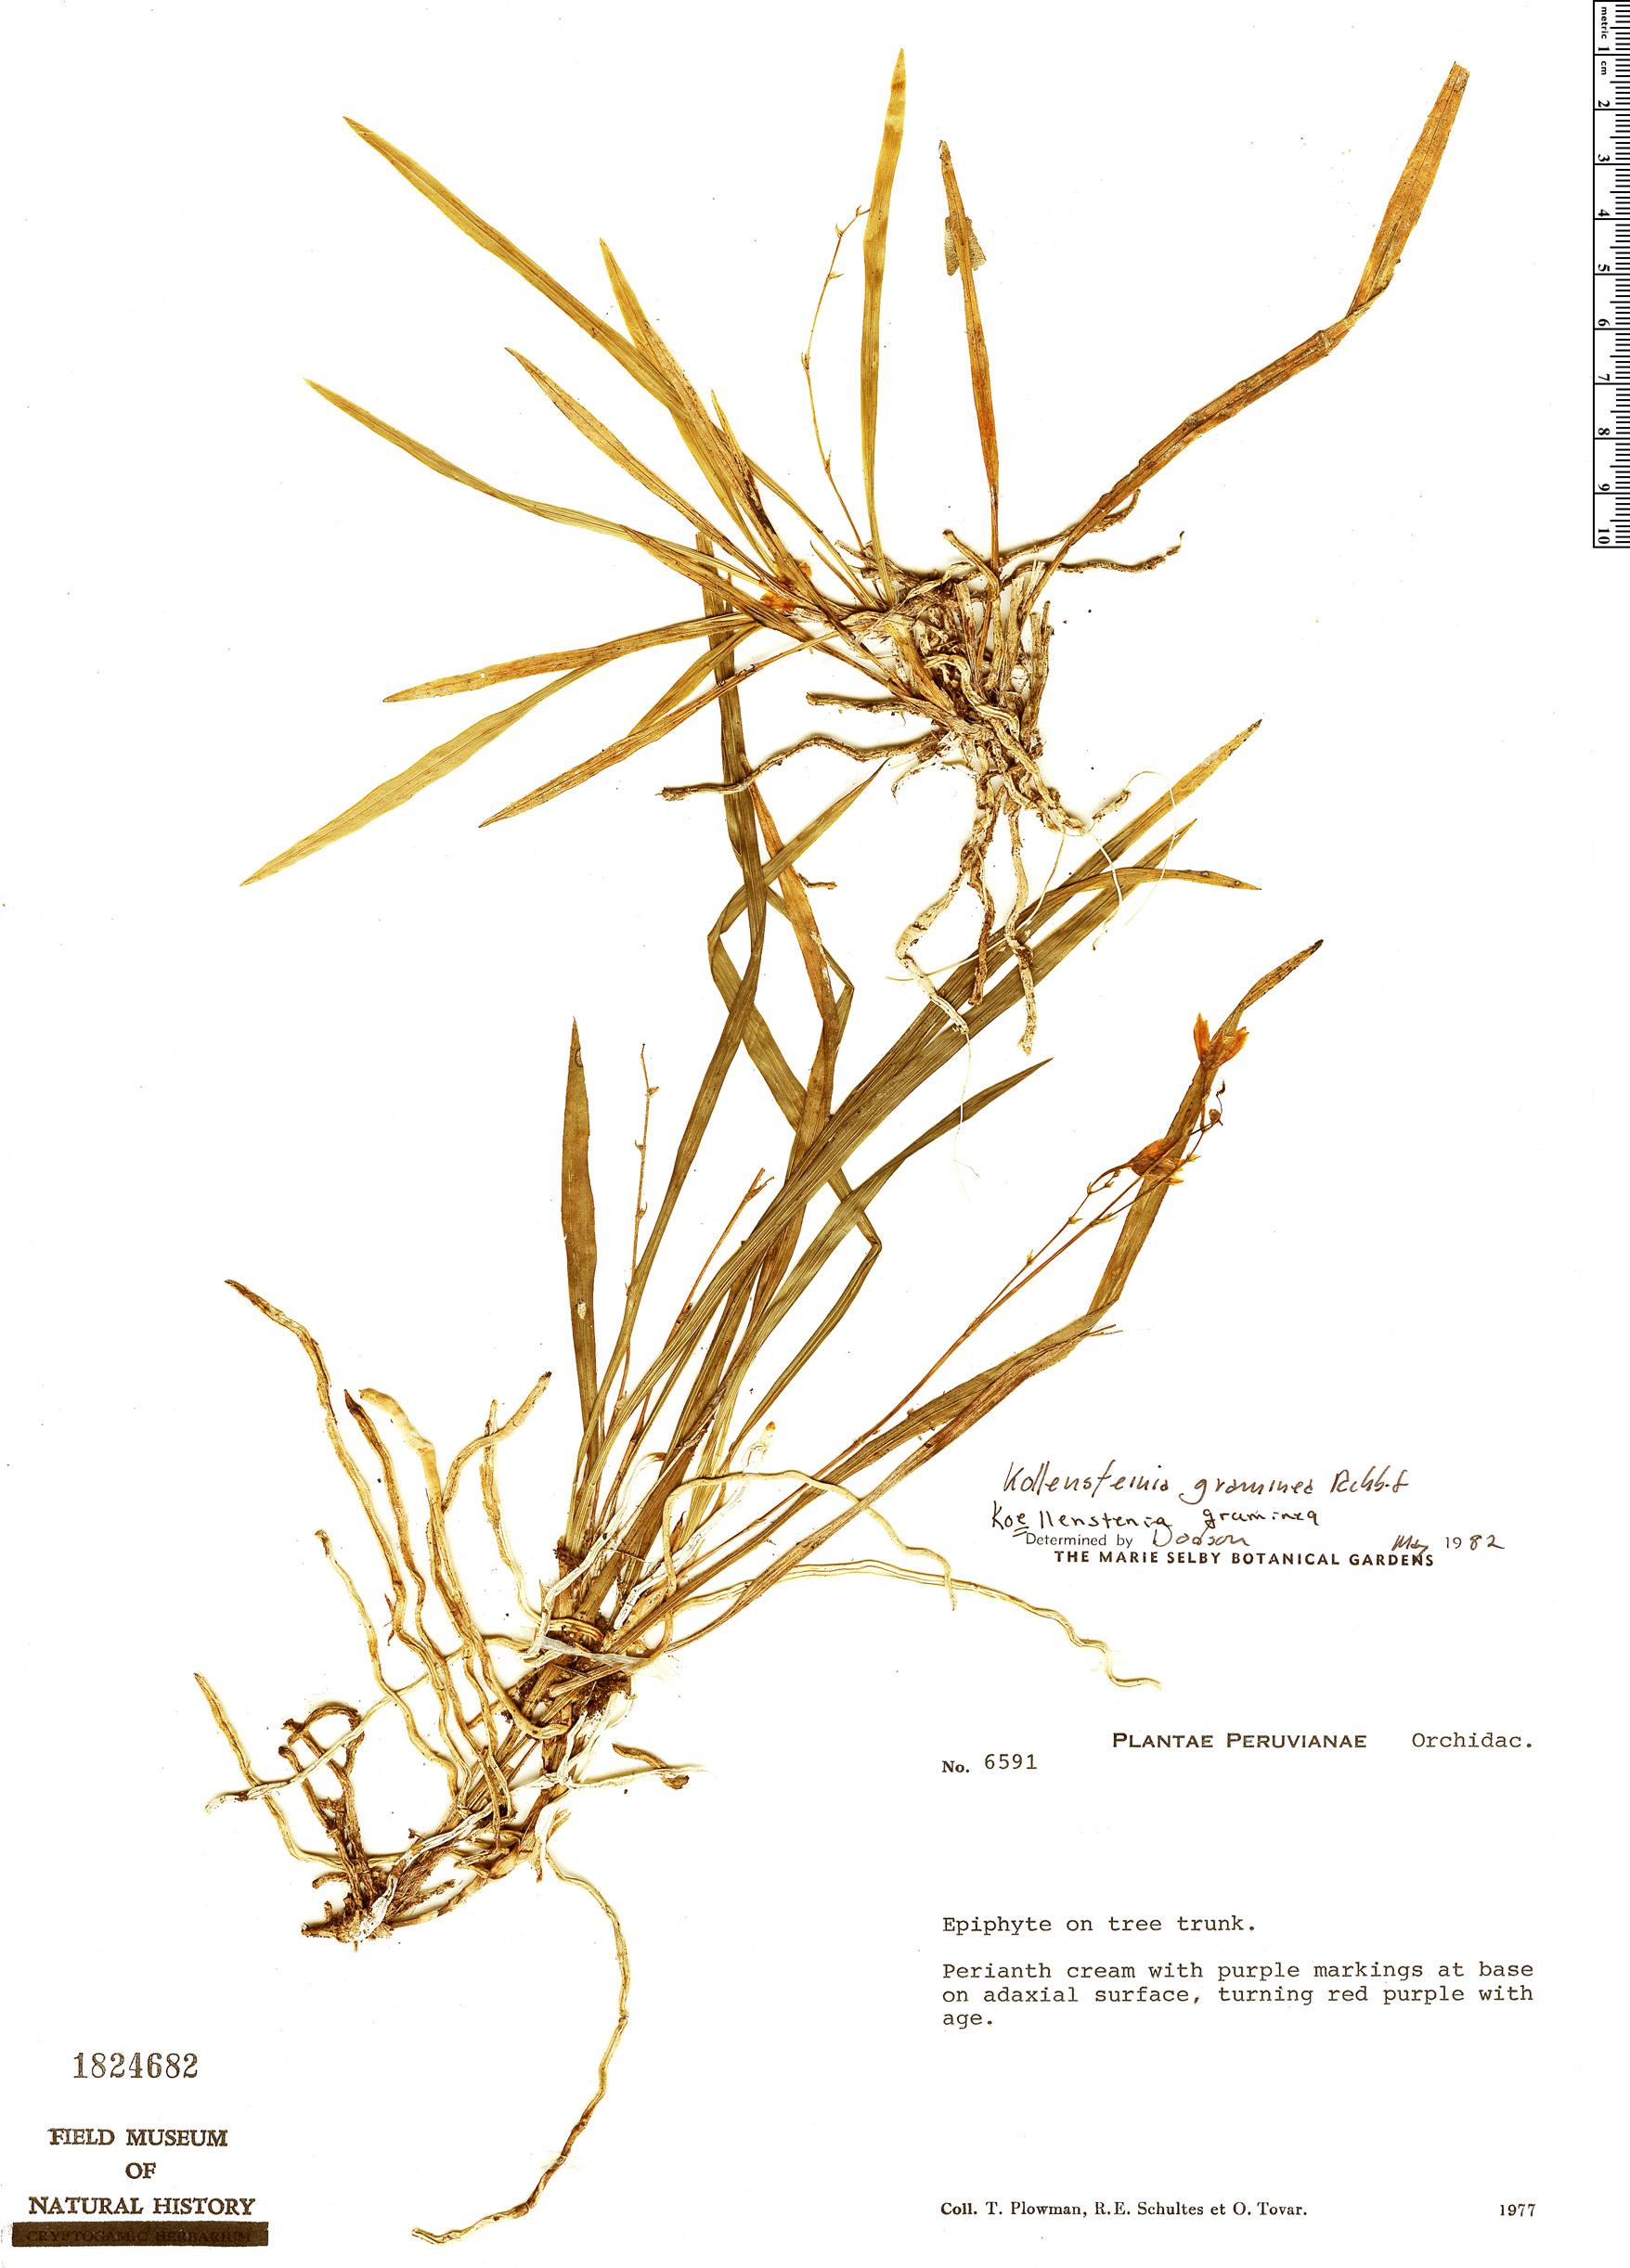 Specimen: Koellensteinia graminea